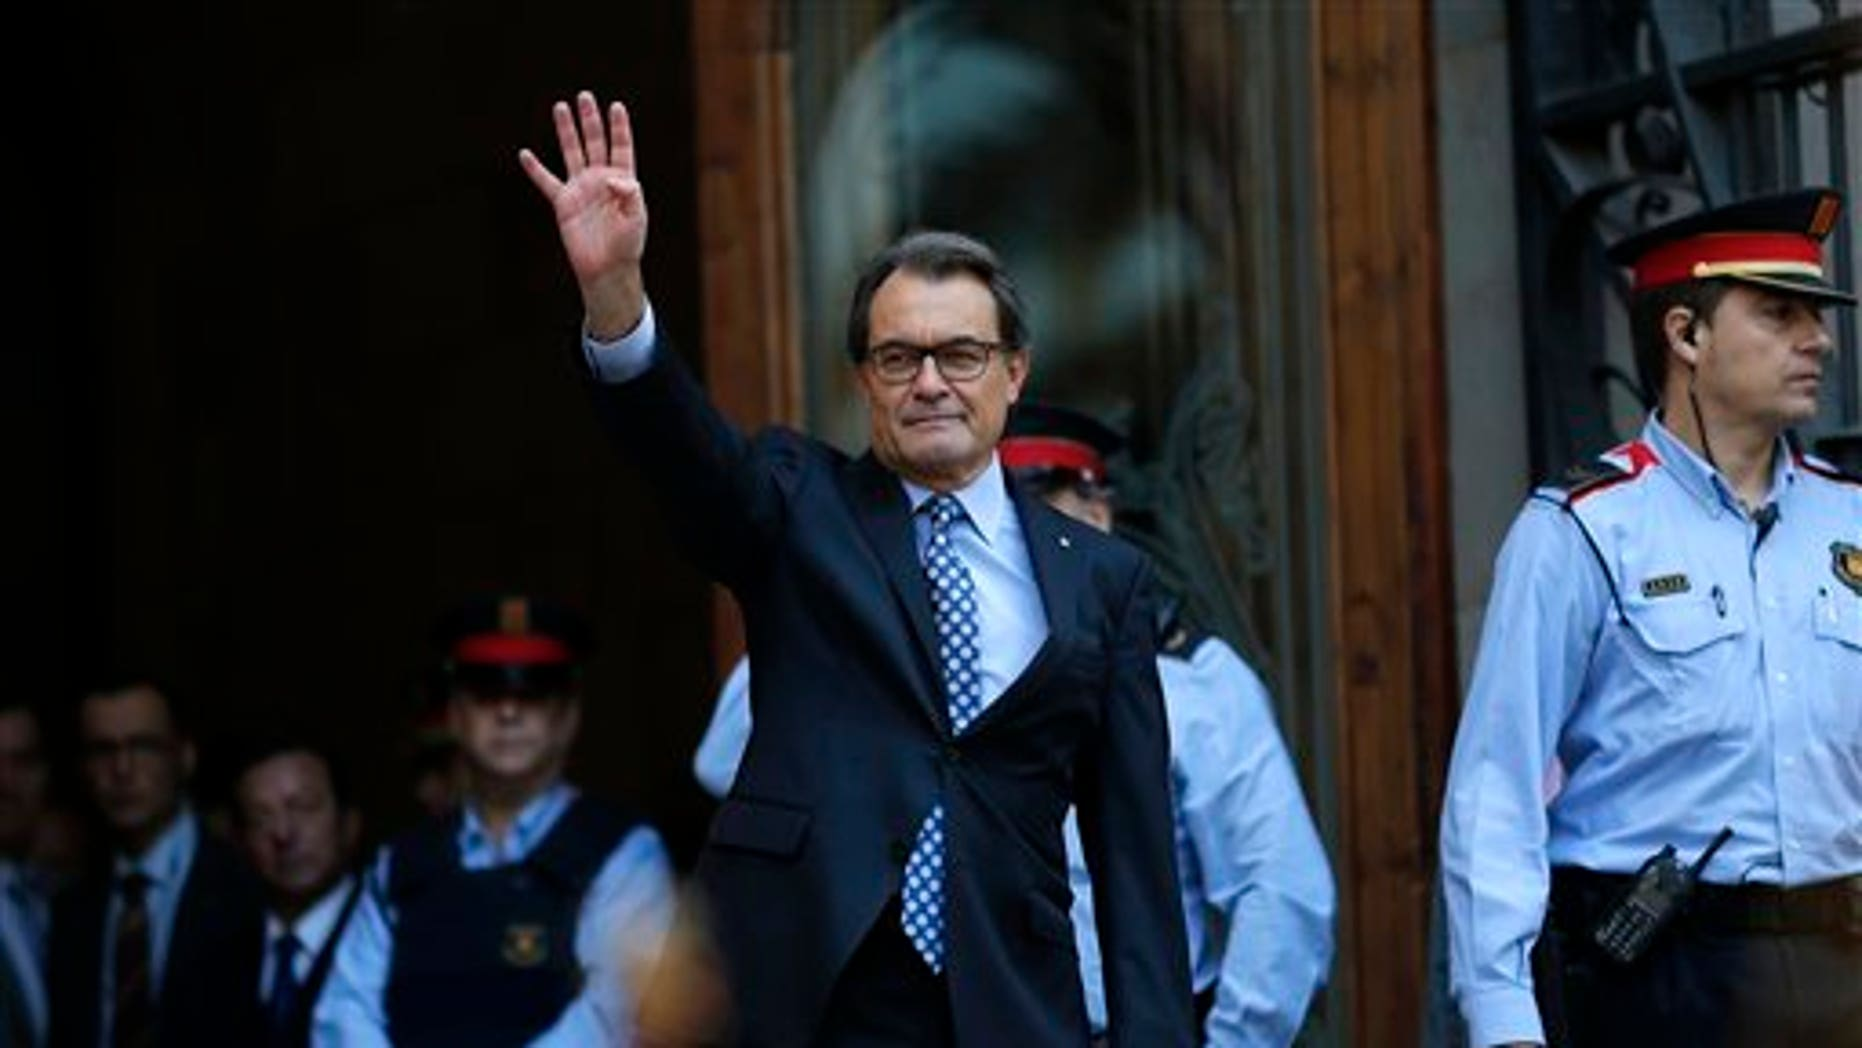 Catalan regional acting president Artur Mas. (AP Photo/Manu Fernandez)